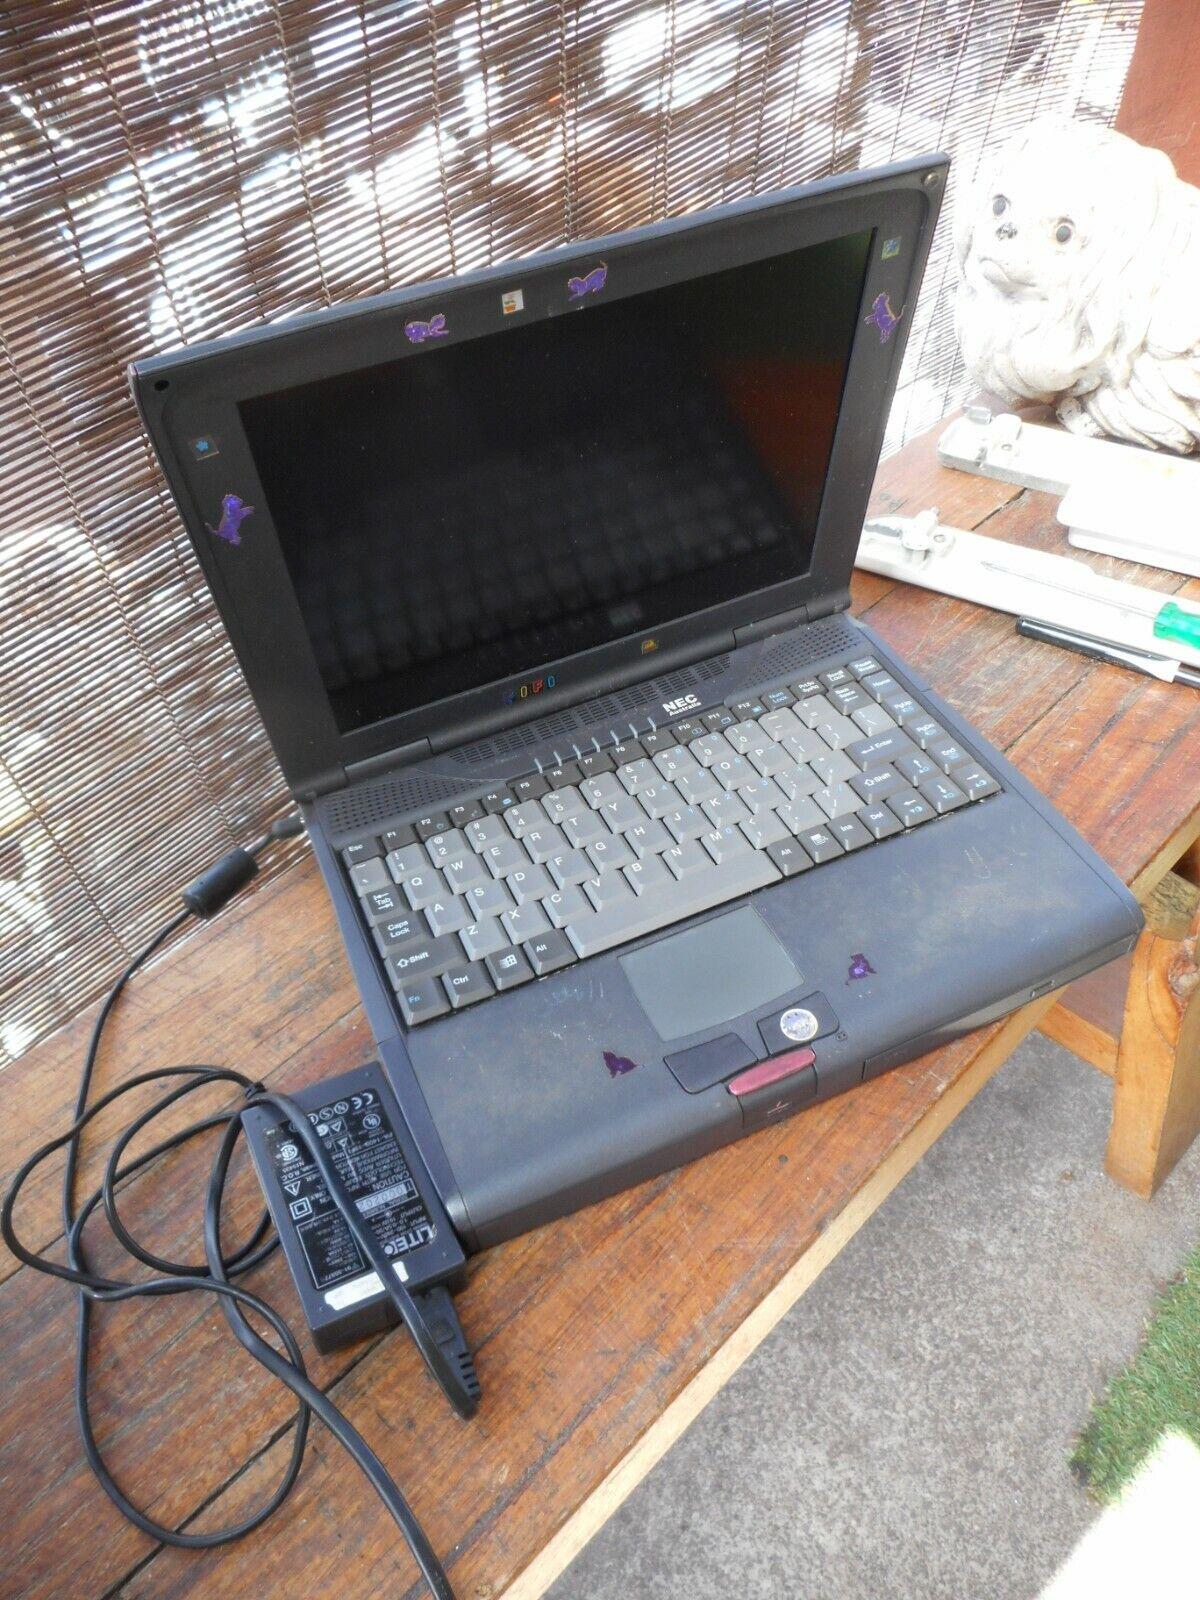 Laptop Windows - vintage NEC Windows 95 laptop